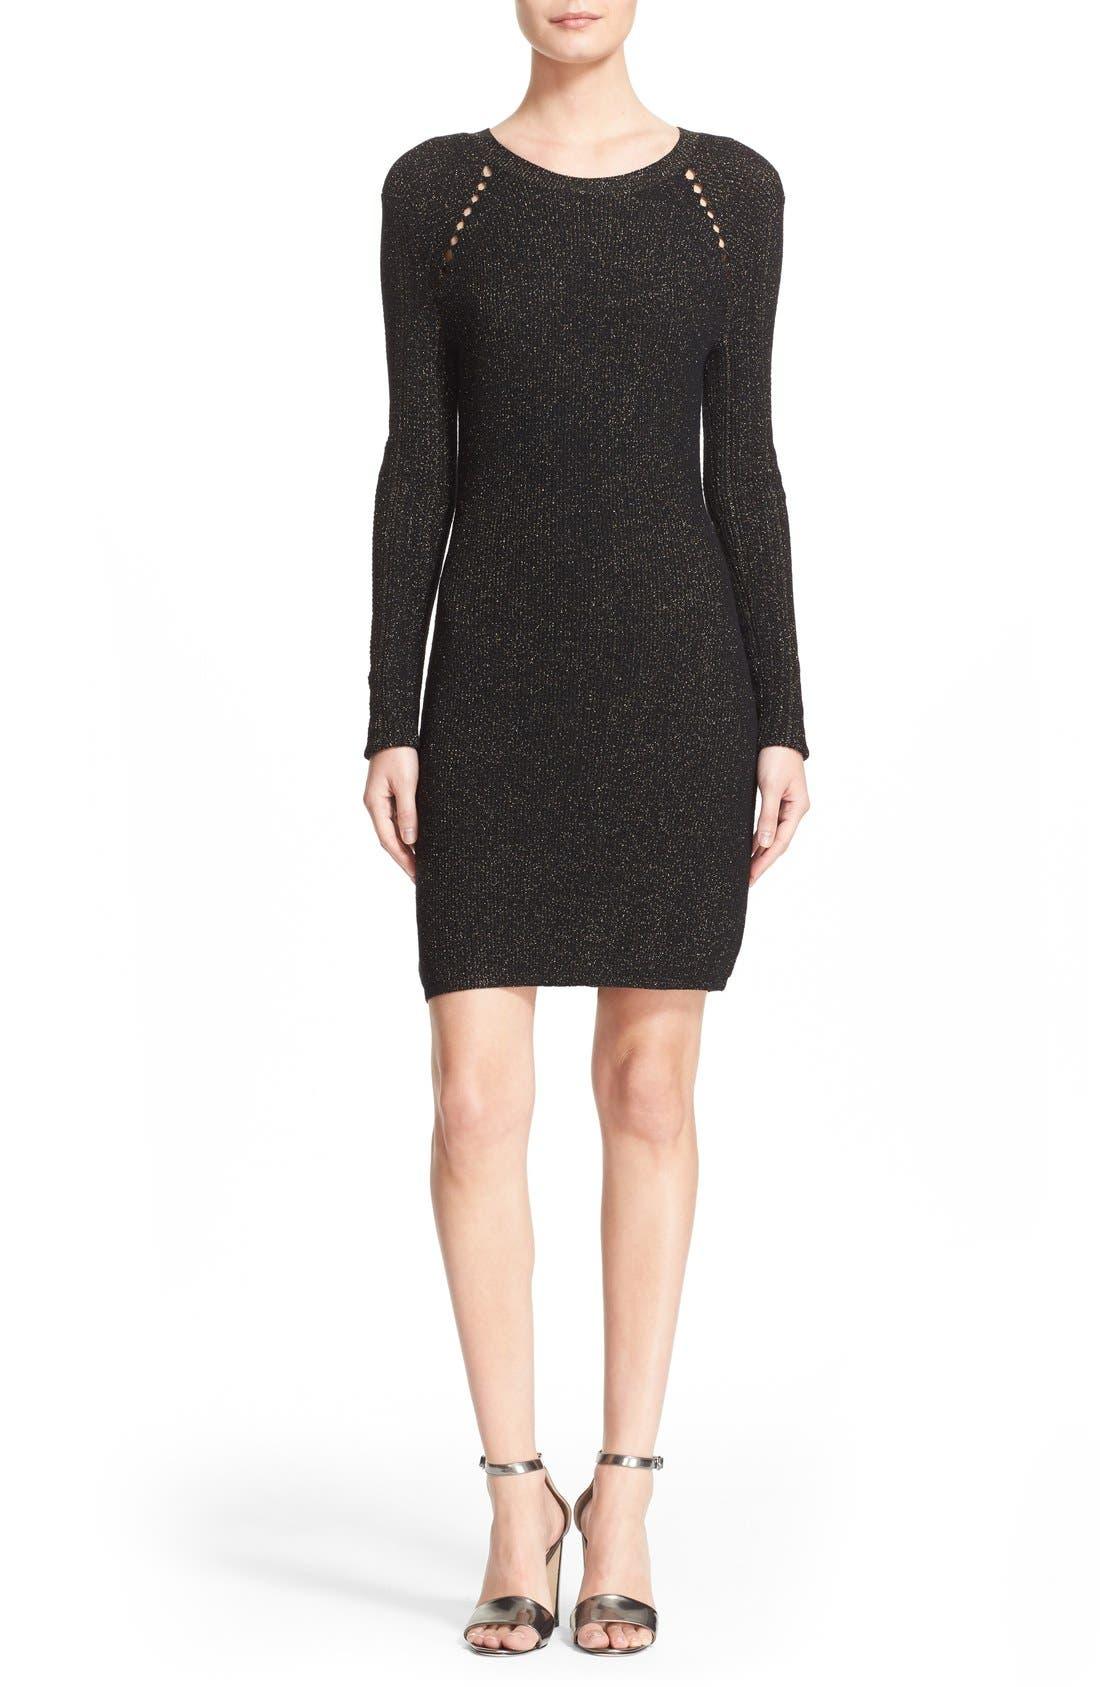 Alternate Image 1 Selected - Derek Lam 10 Crosby Metallic Sheath Dress